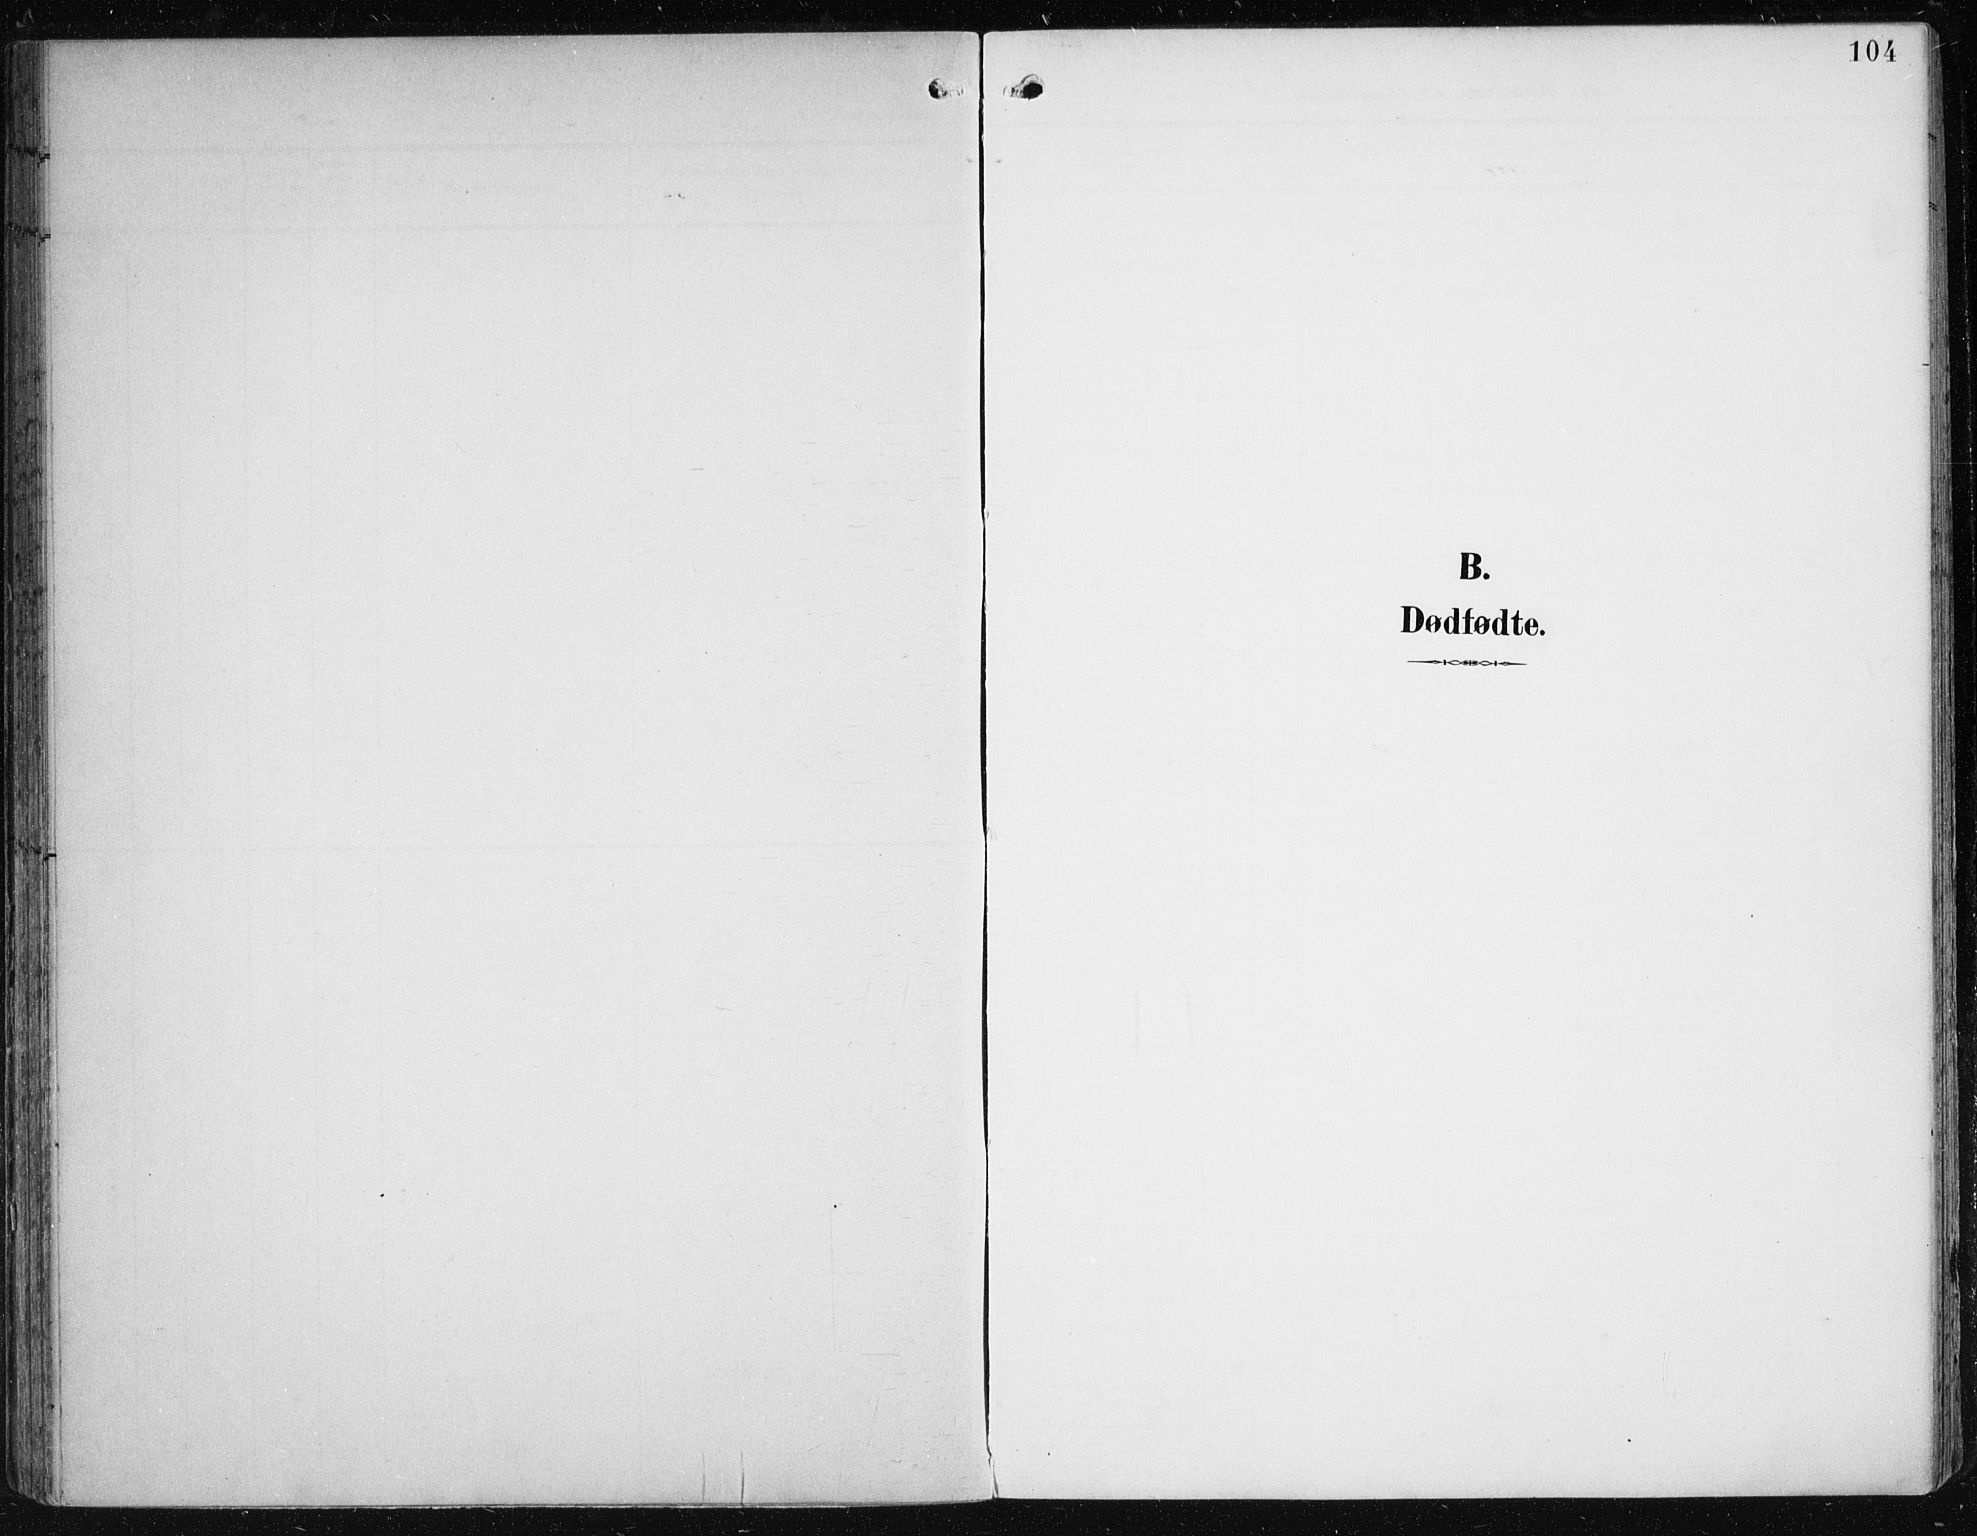 SAB, Fana Sokneprestembete, H/Haa/Haai/L0003: Ministerialbok nr. I 3, 1900-1912, s. 104